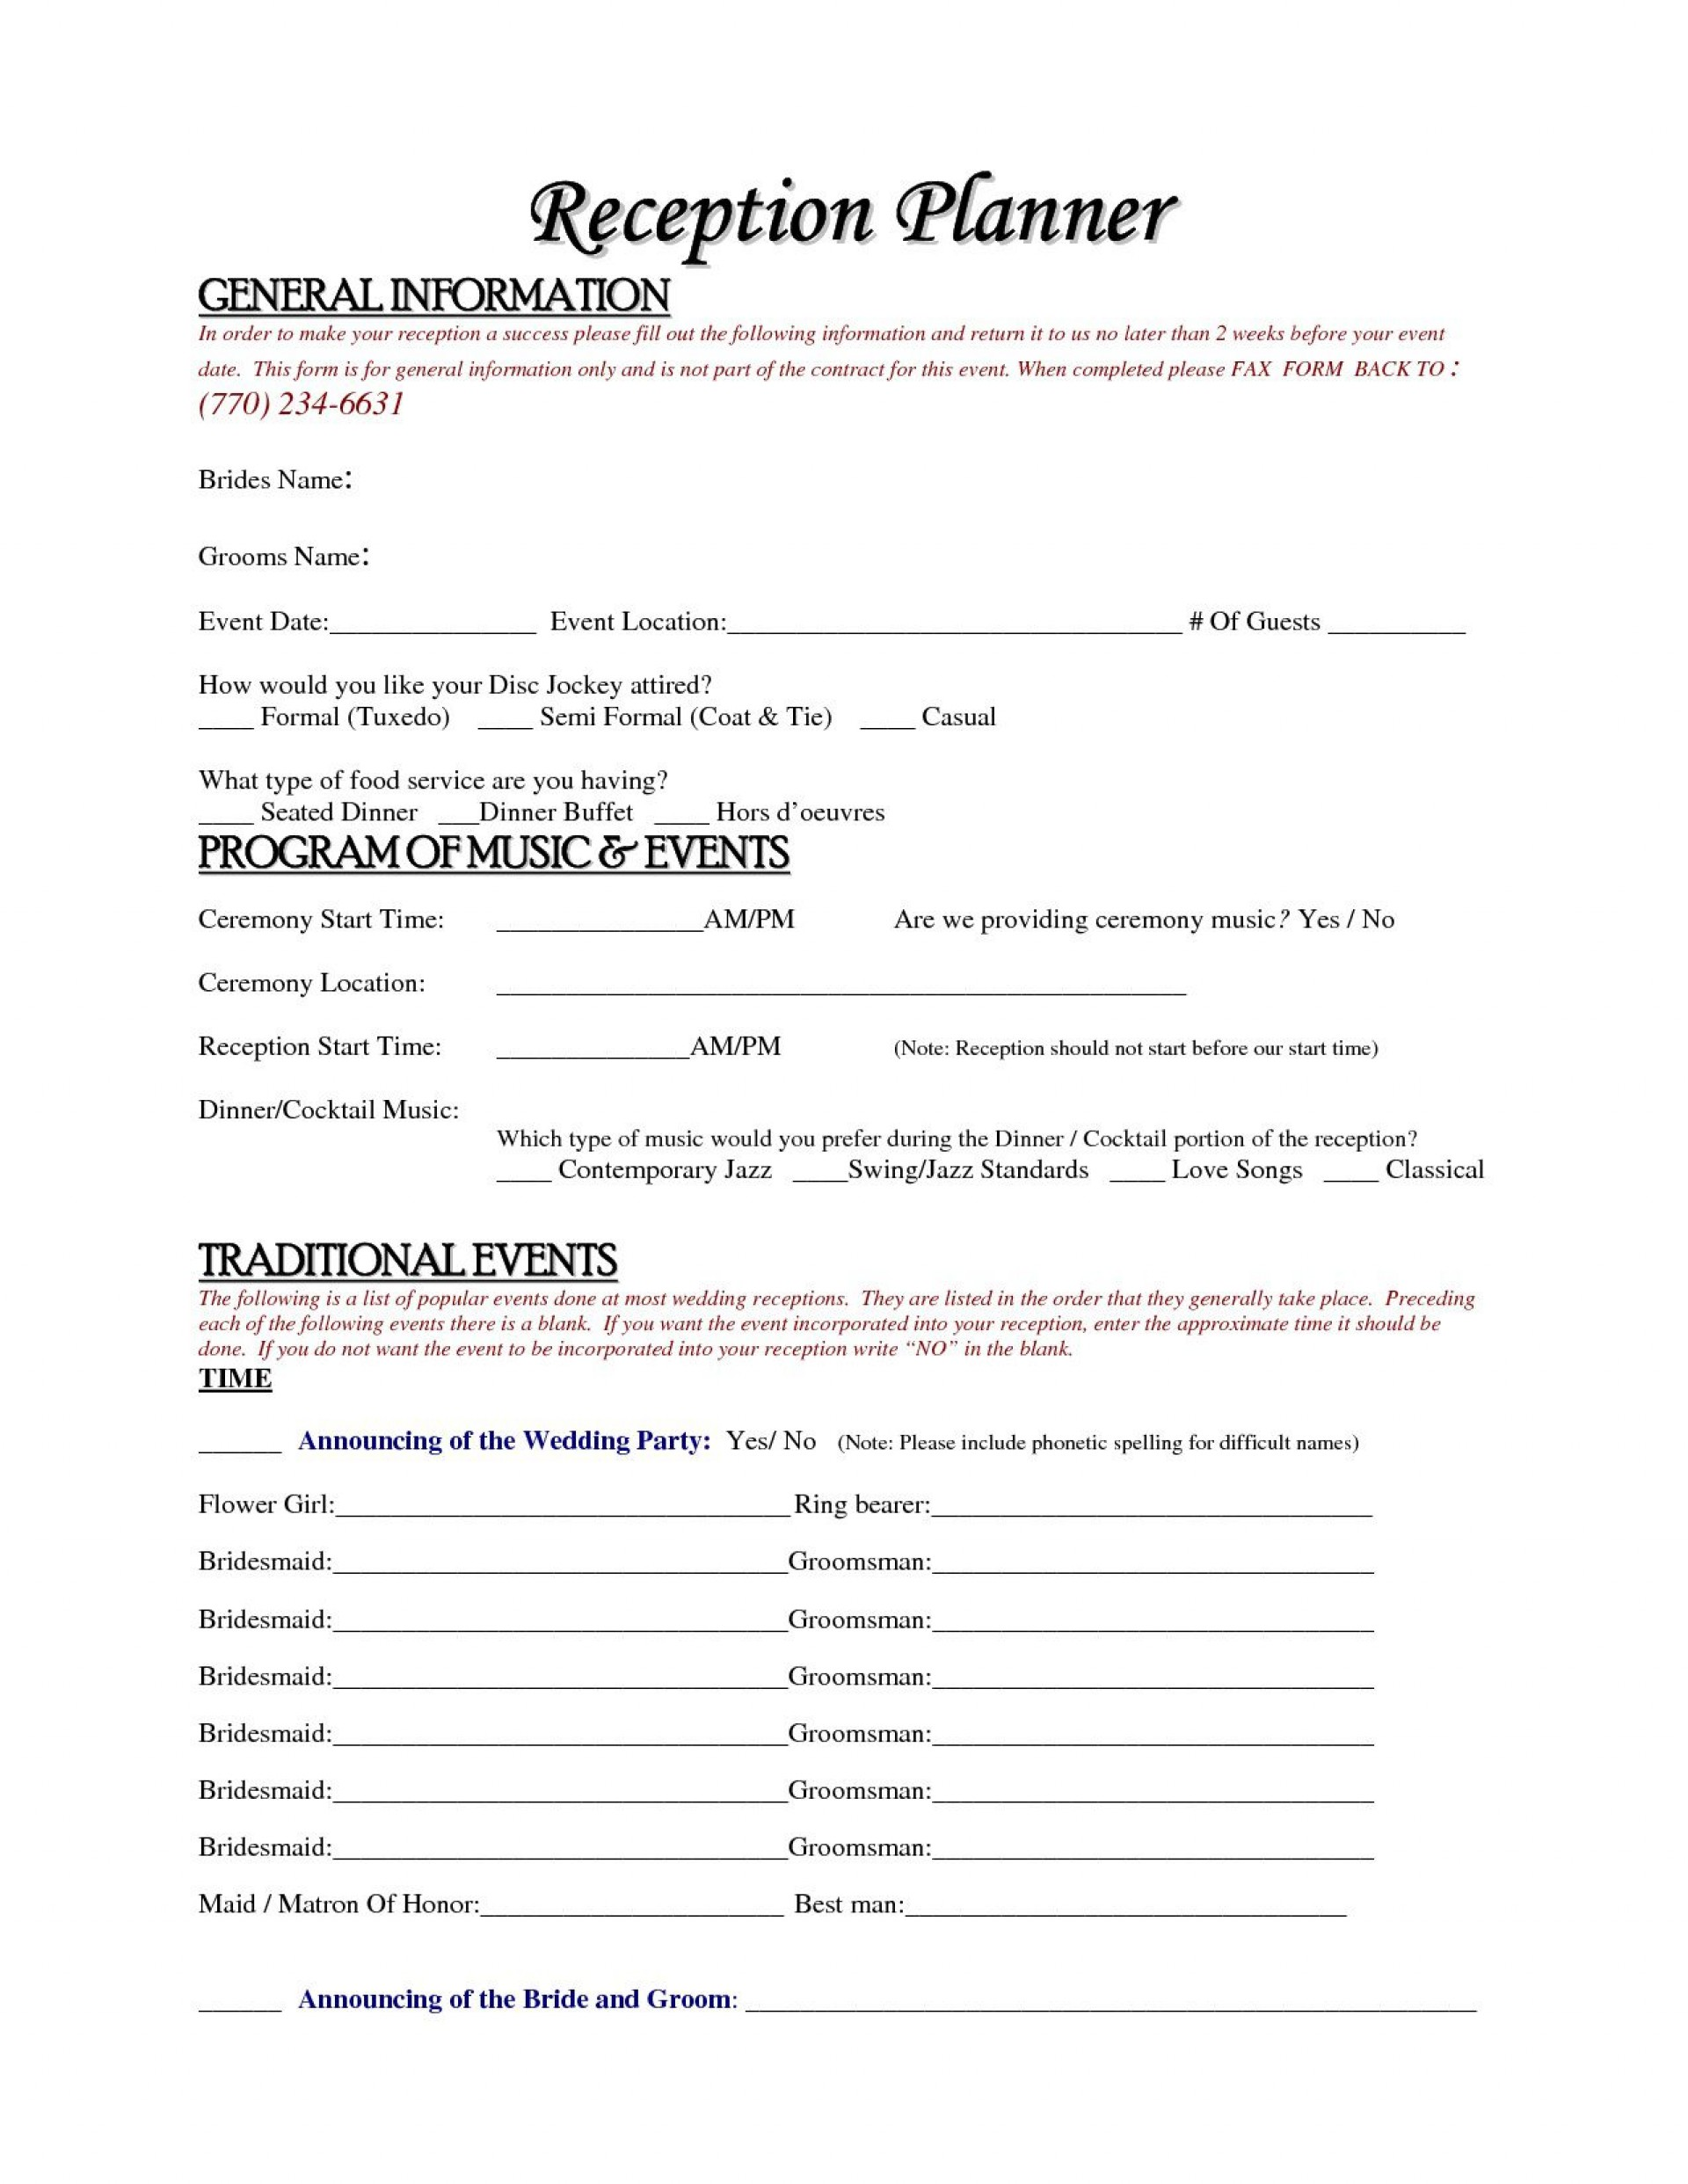 004 Simple Wedding Planner Contract Template Idea  Word Planning Coordinator Free1920